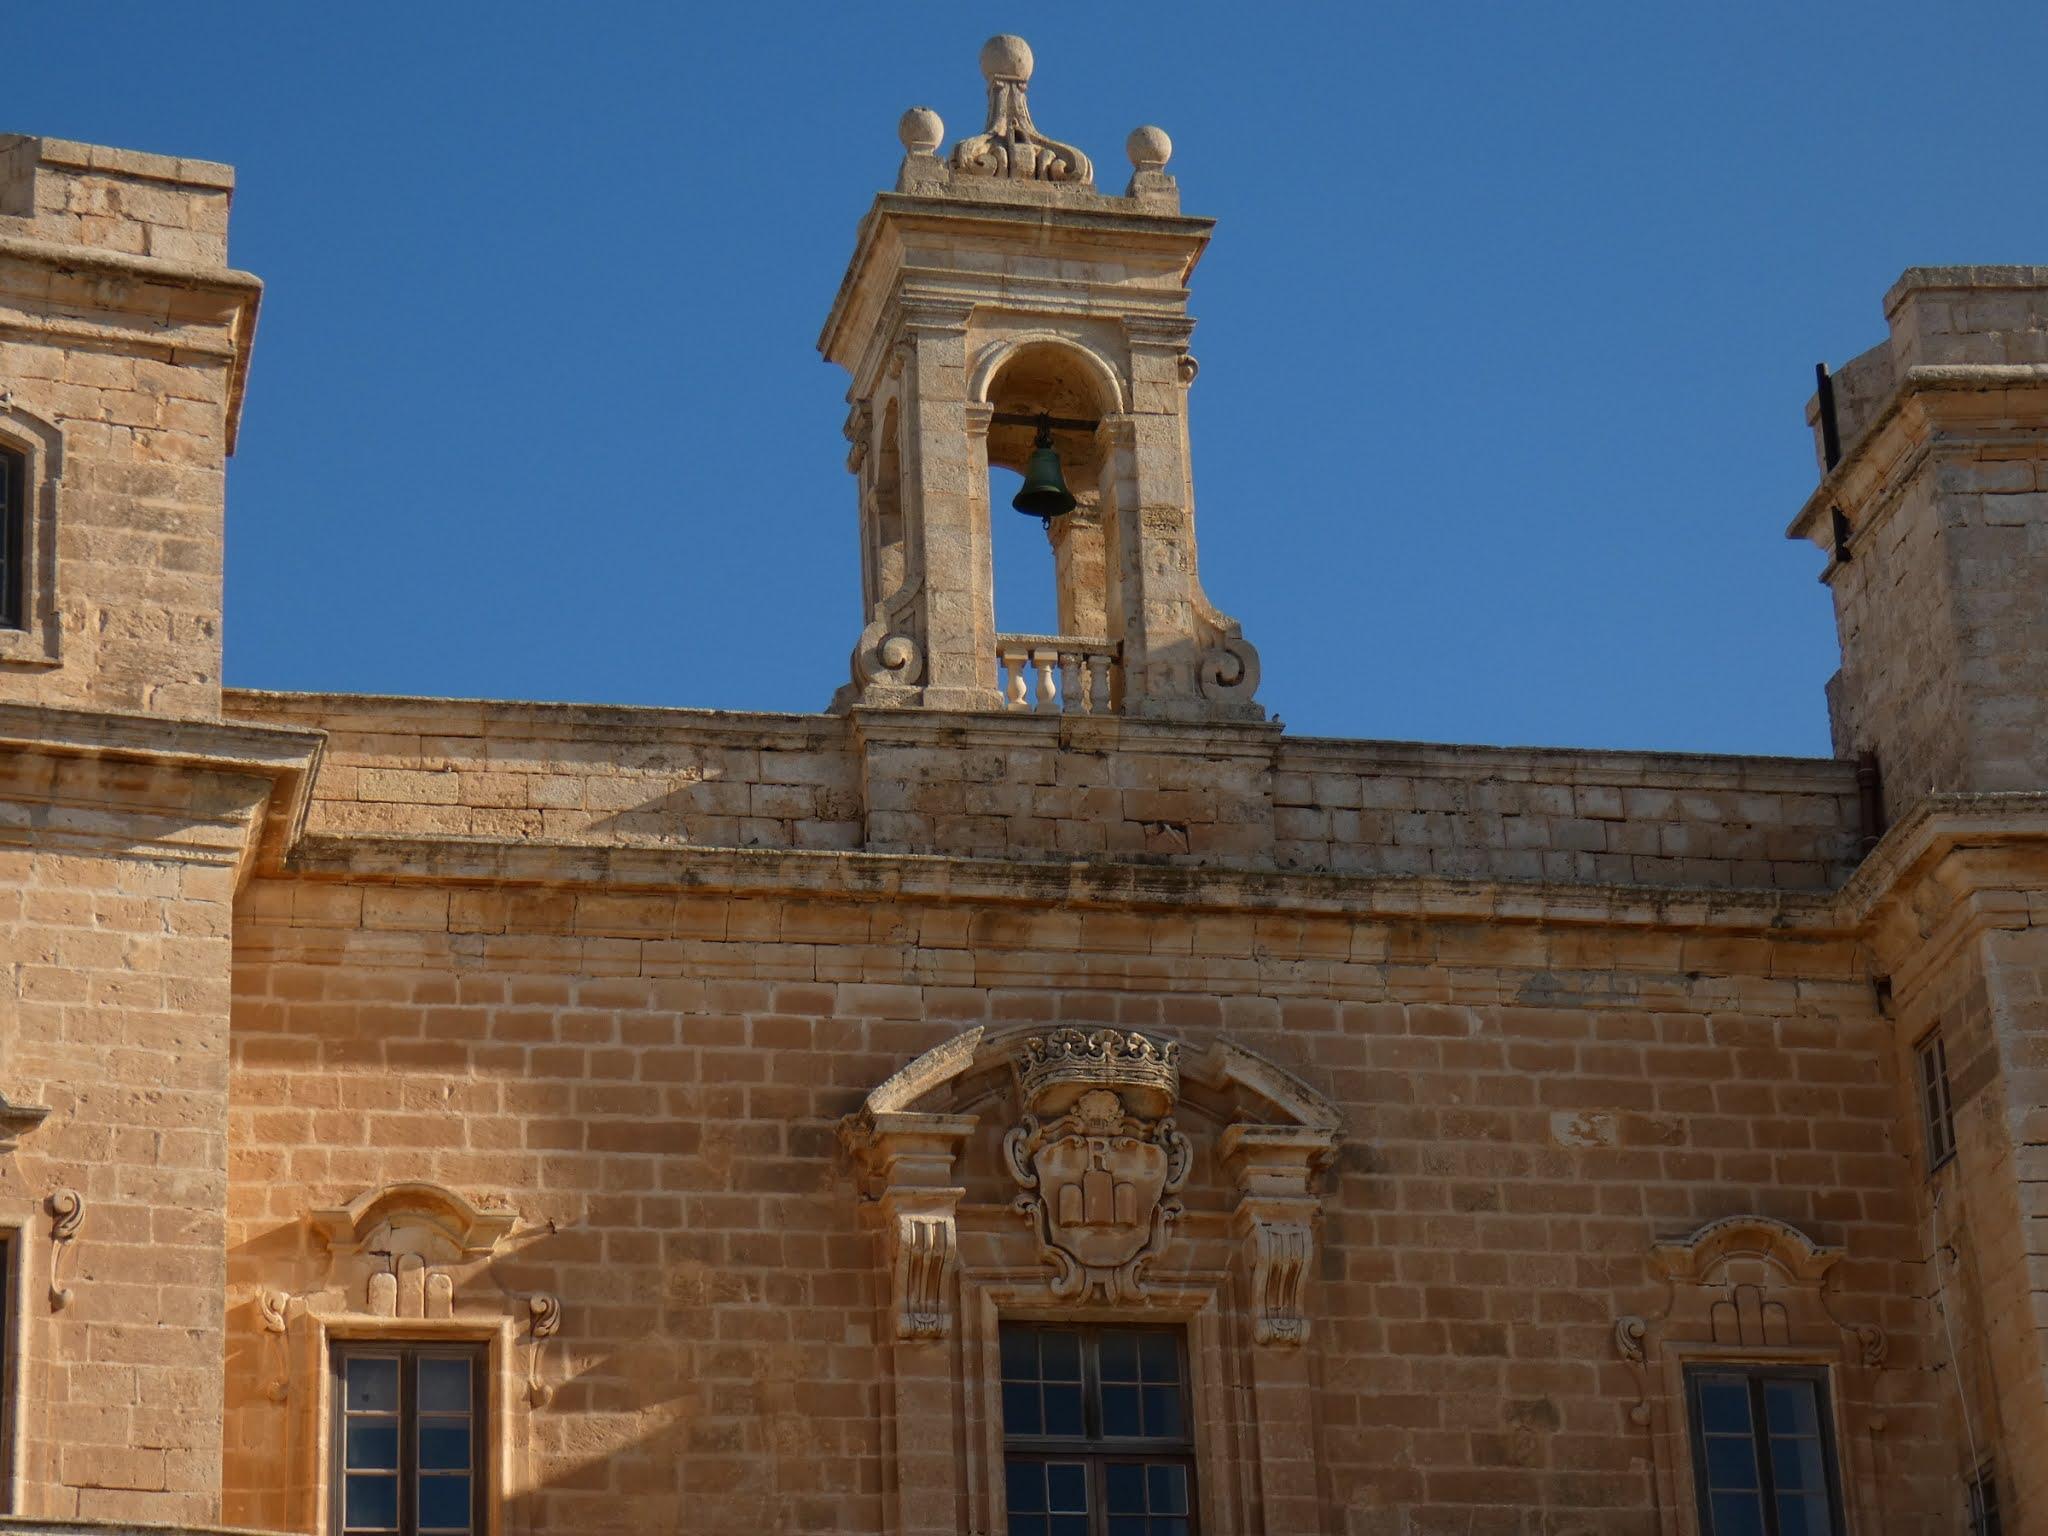 Sincerely Loree: Selmun Palace, Malta